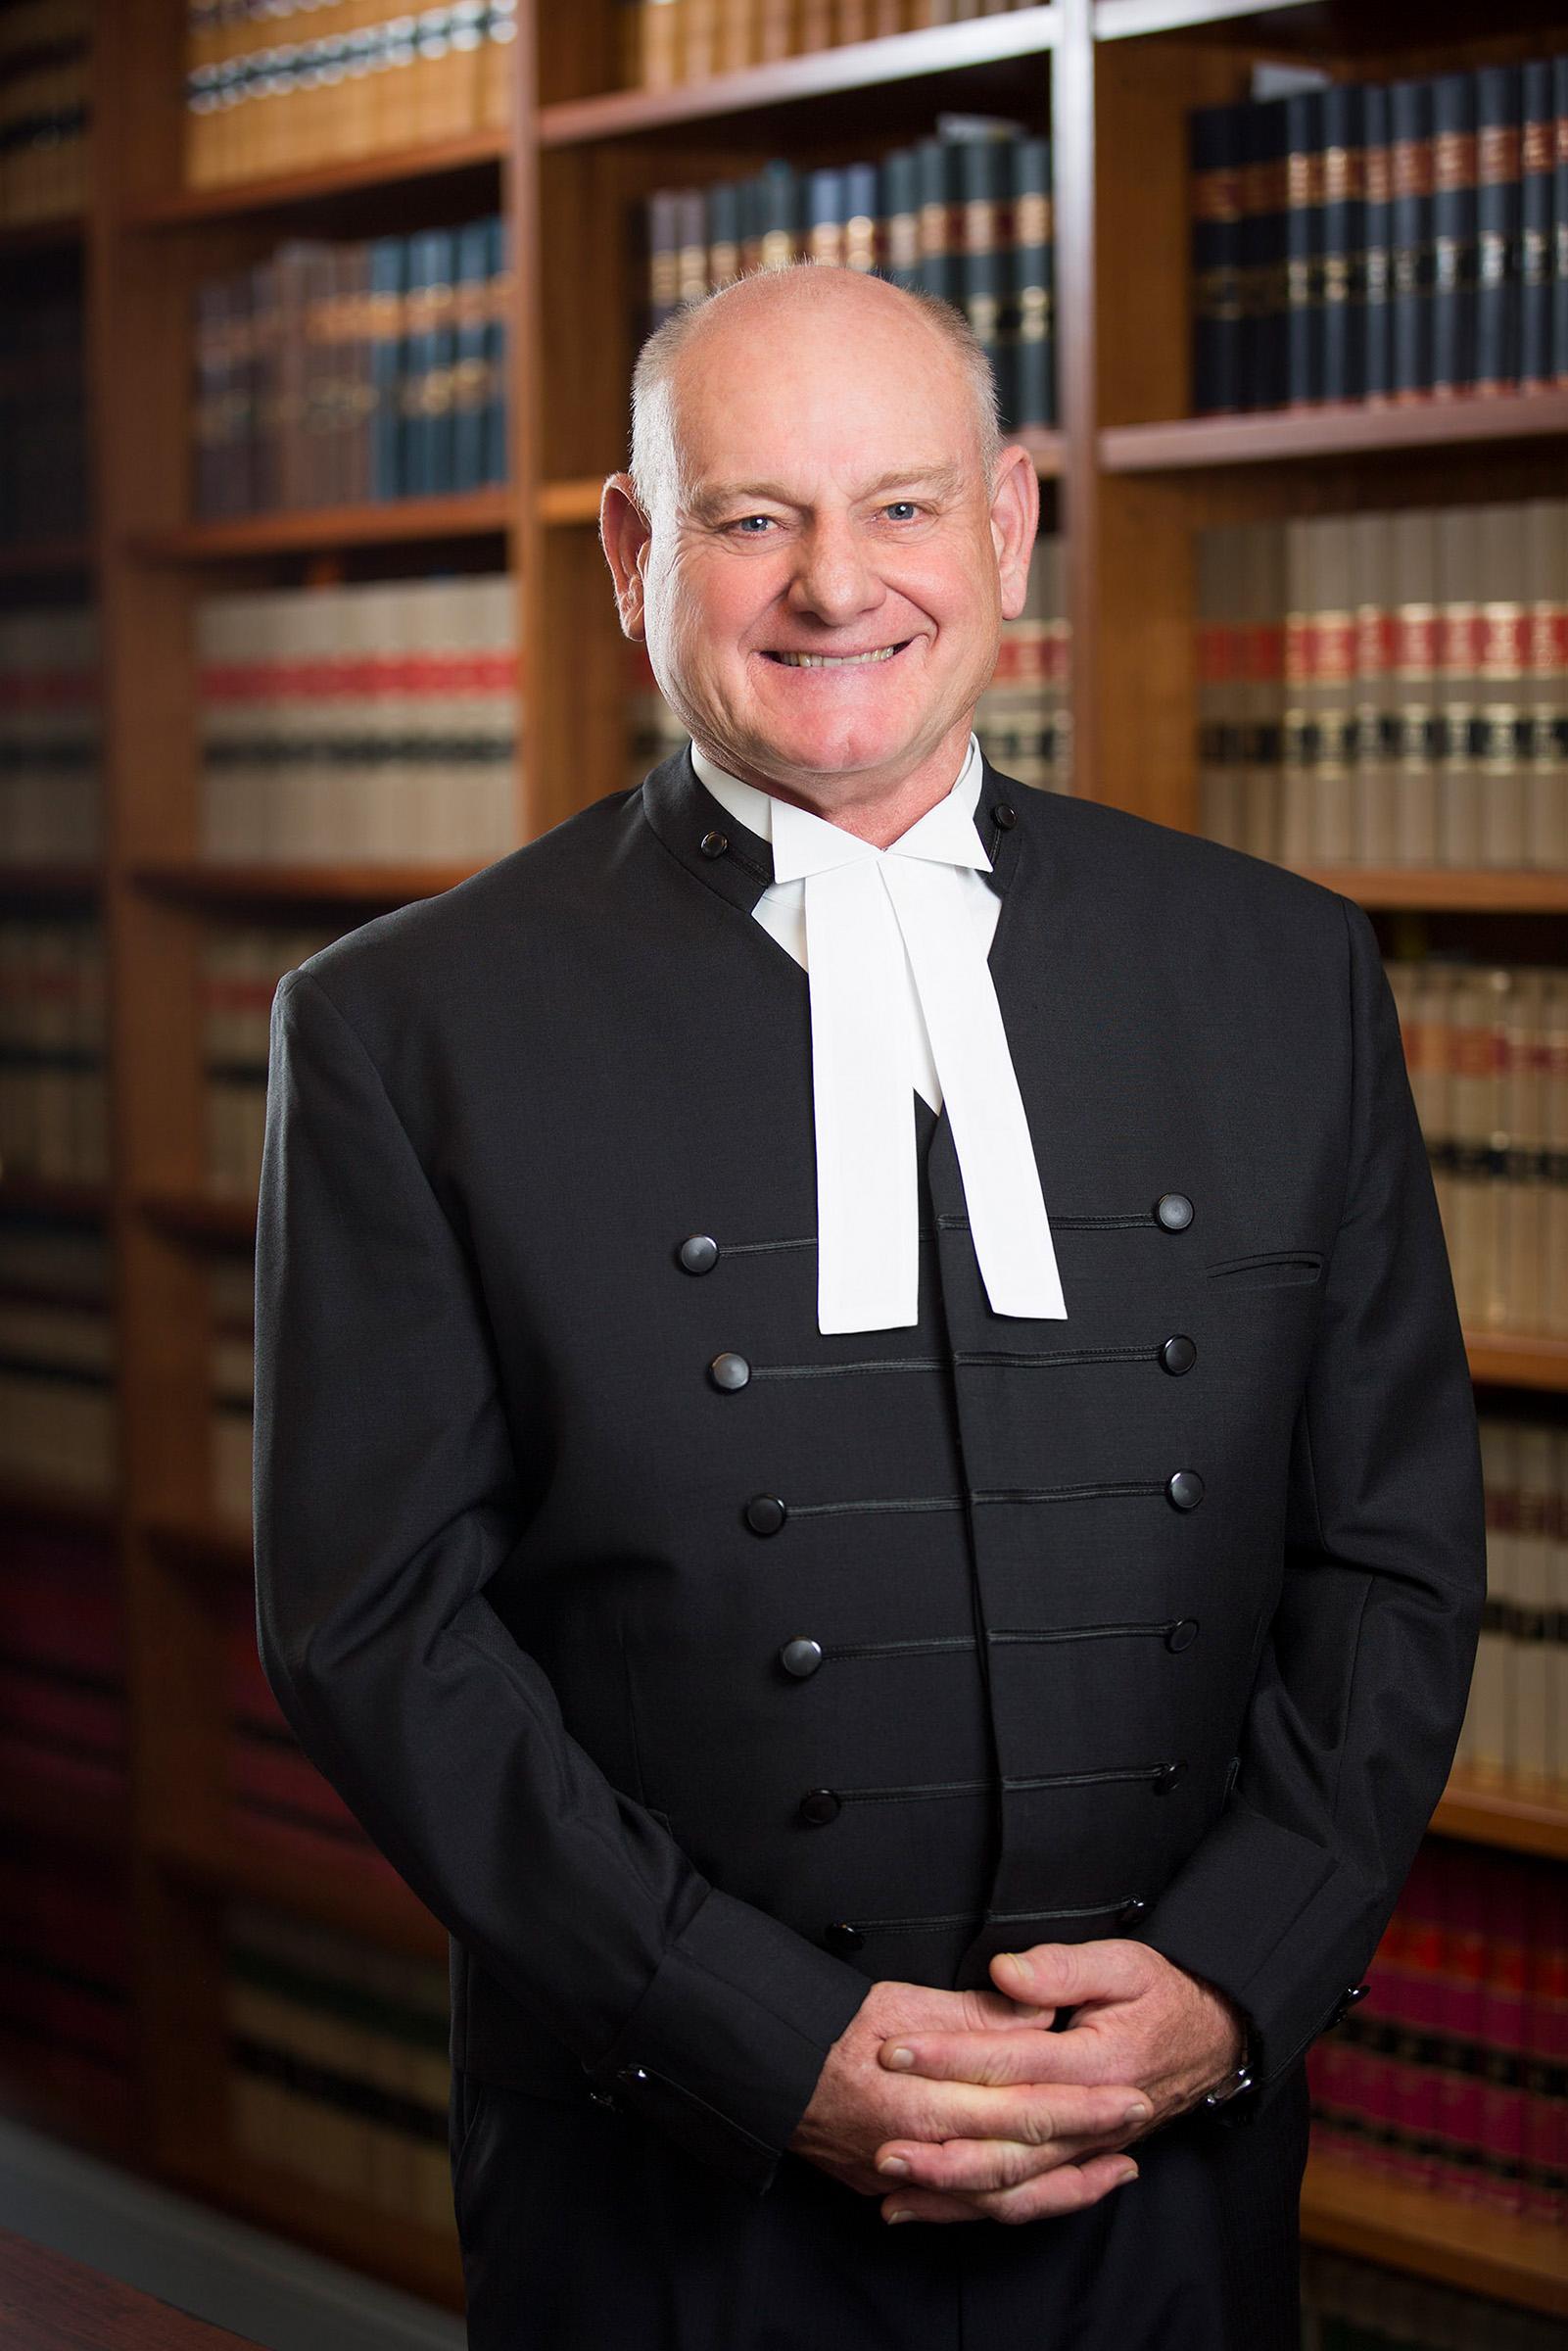 Corporate environmental barrister portrait photography Scot Wheelhouse SC Sir Anthony Mason Chambers bookcase background